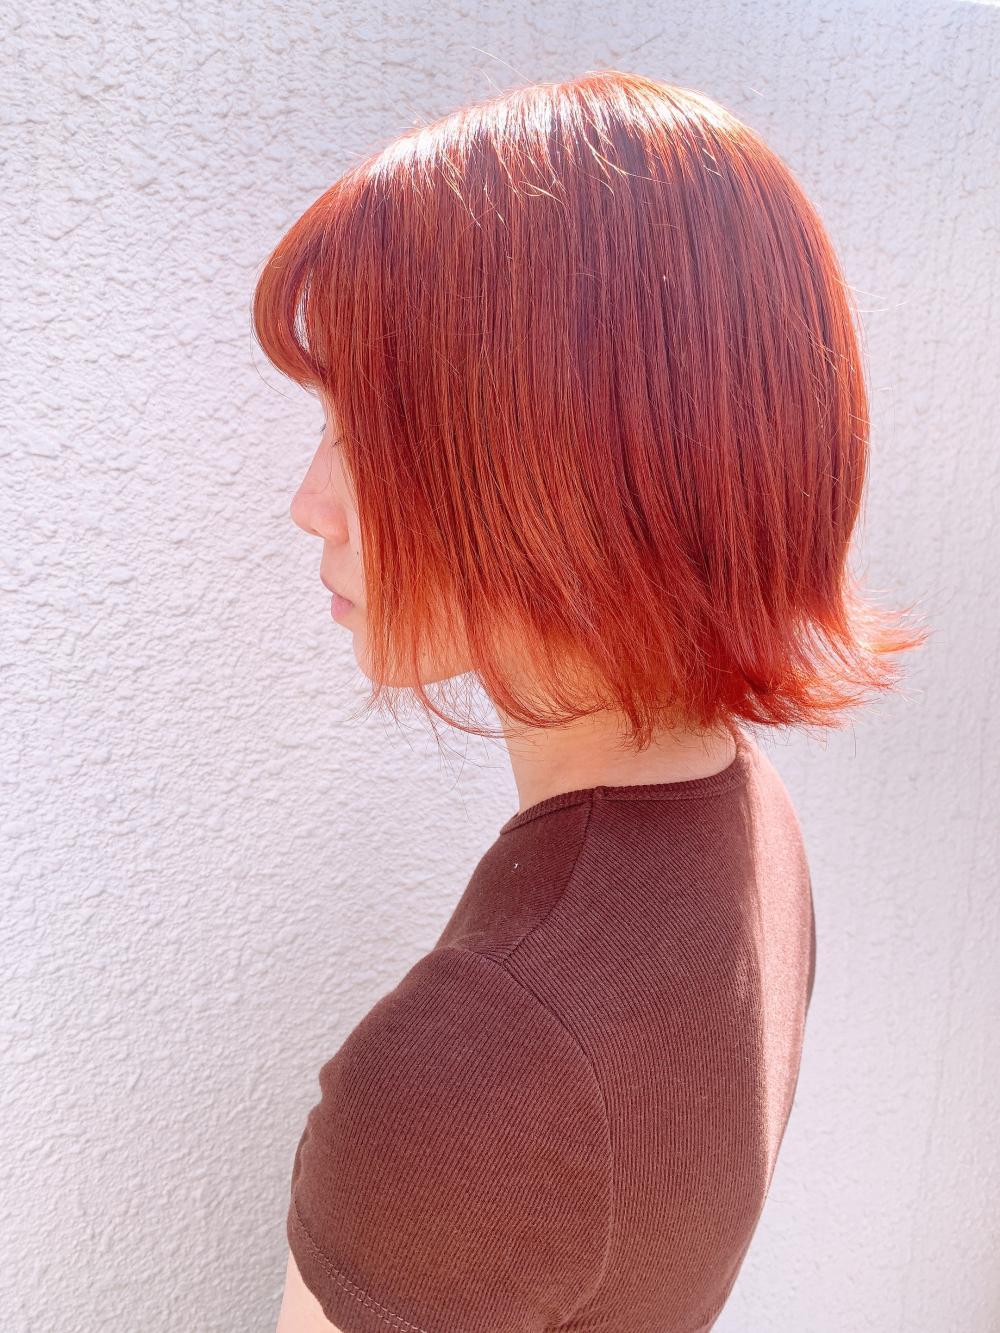 Lia&汐見悠佑 大人かわいいボブorangeカラー